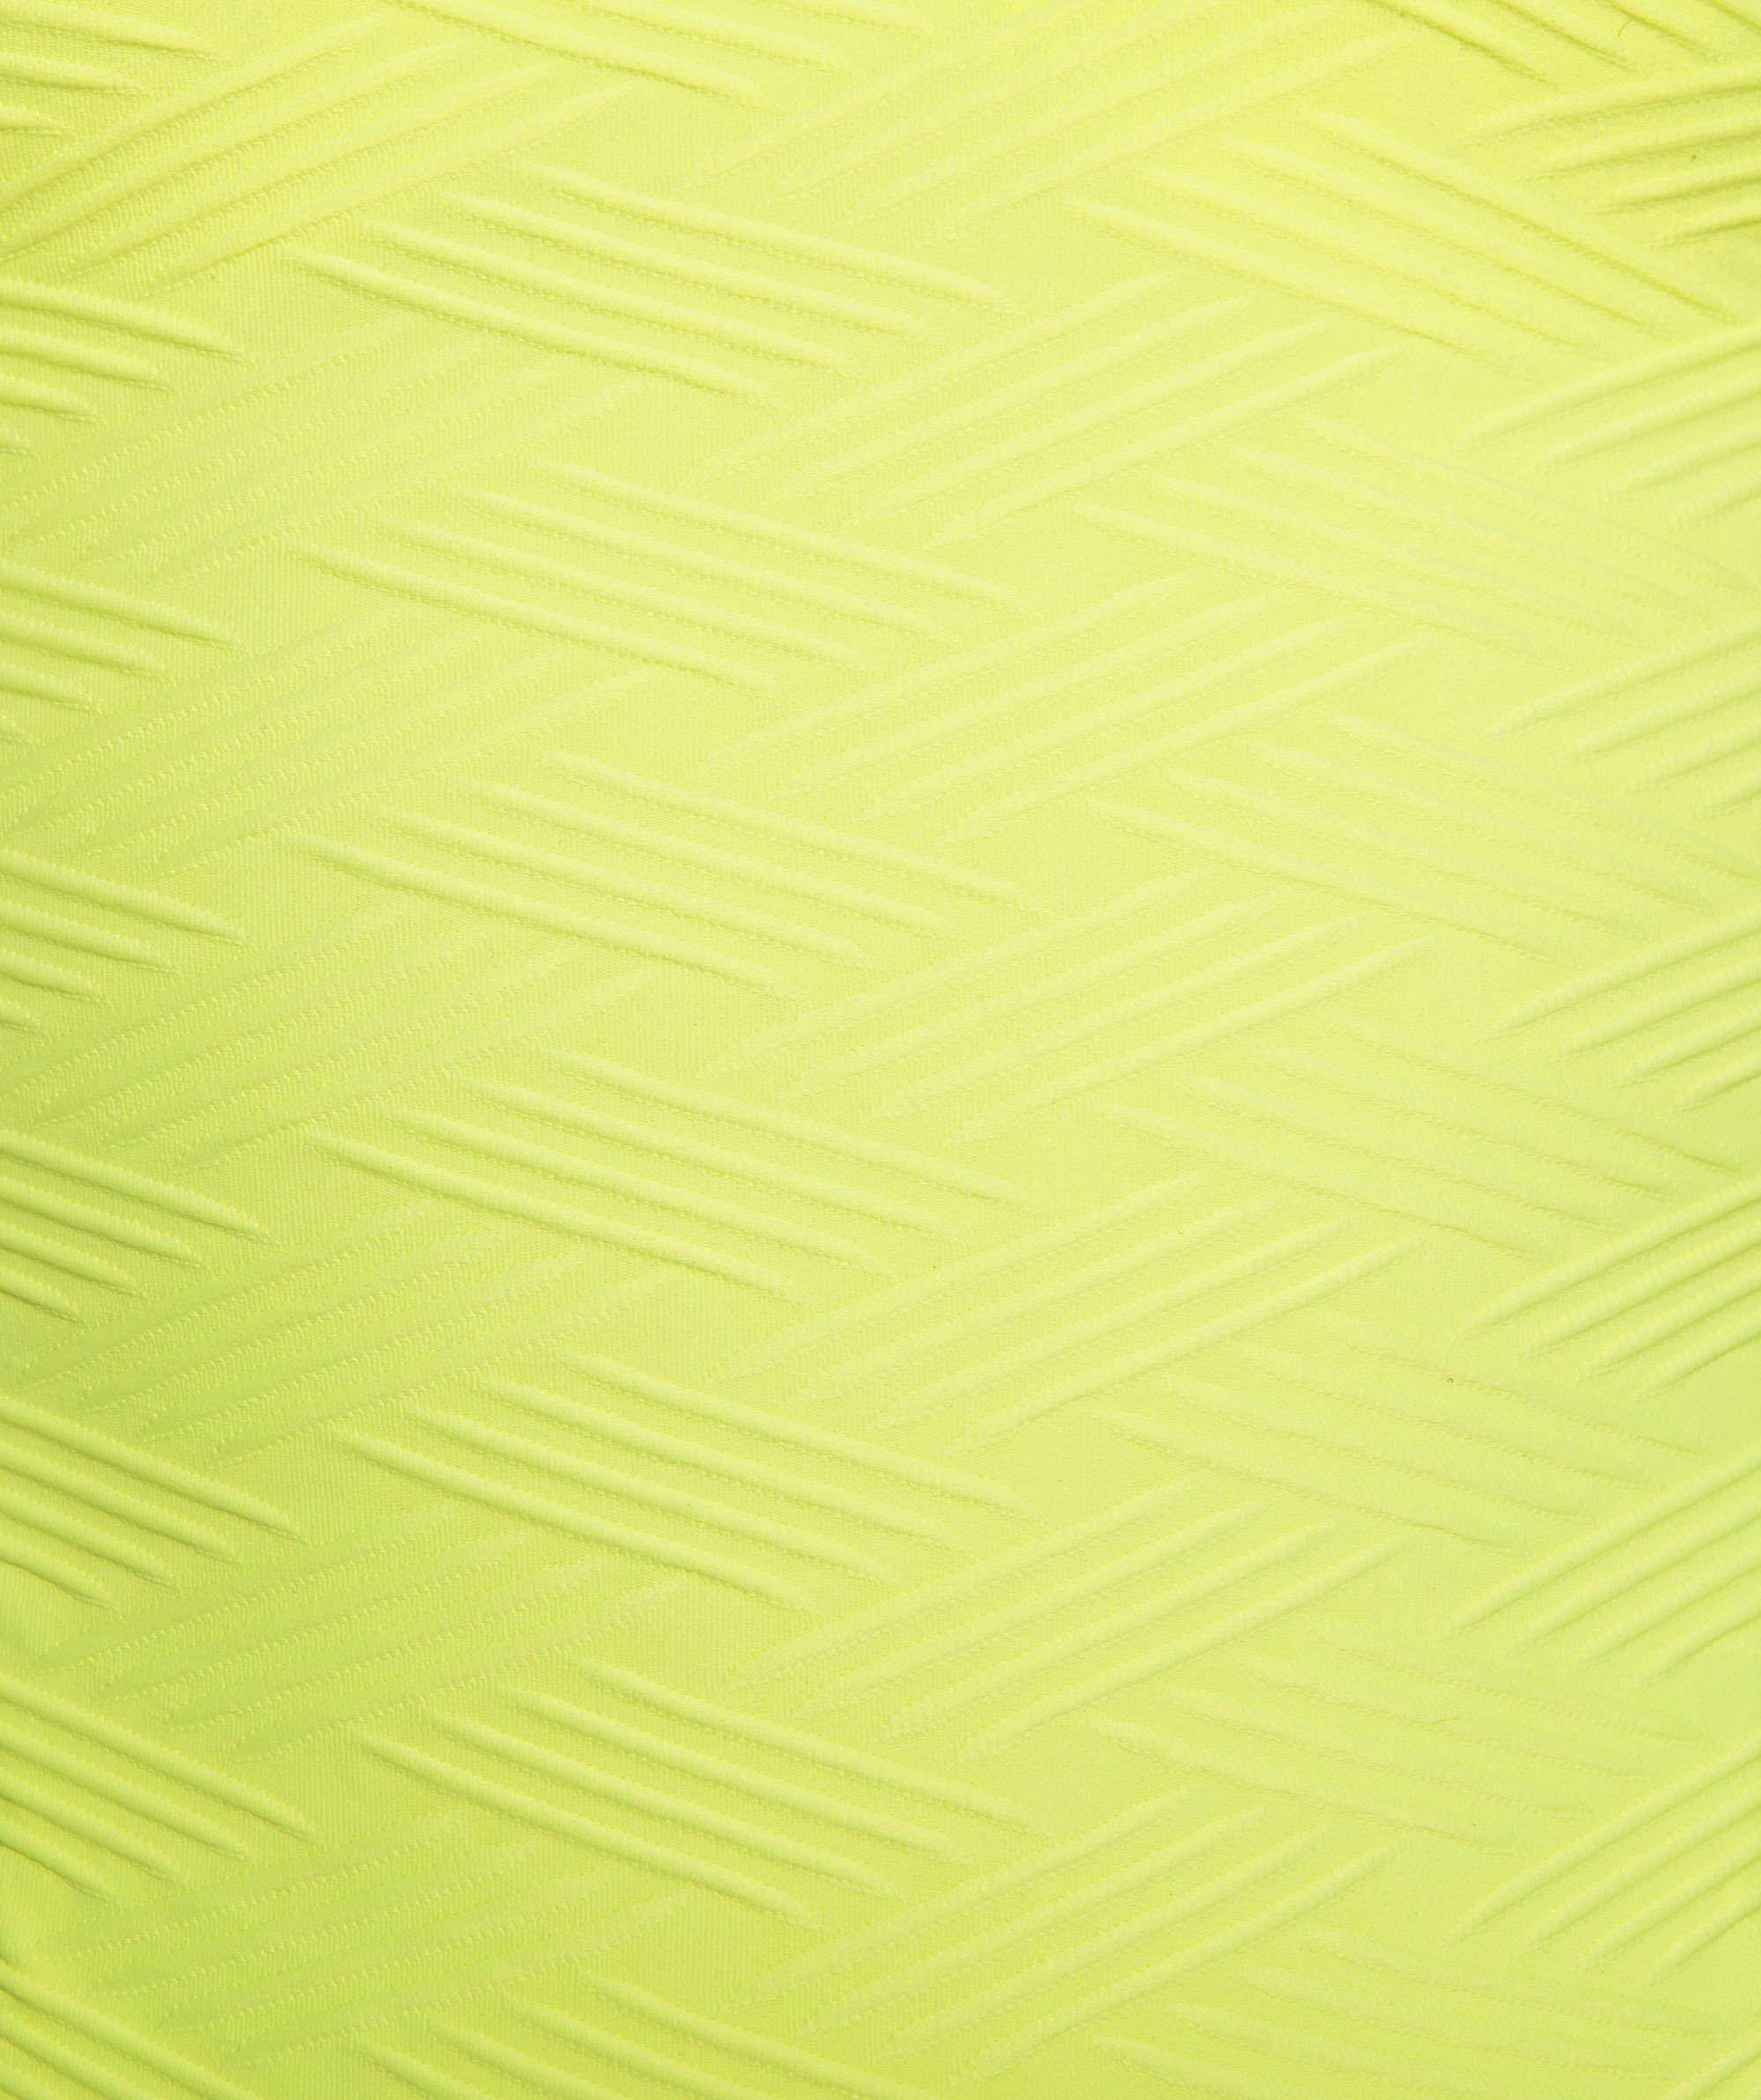 Vamp Vixen Push Up Swim Top - Light Yellow